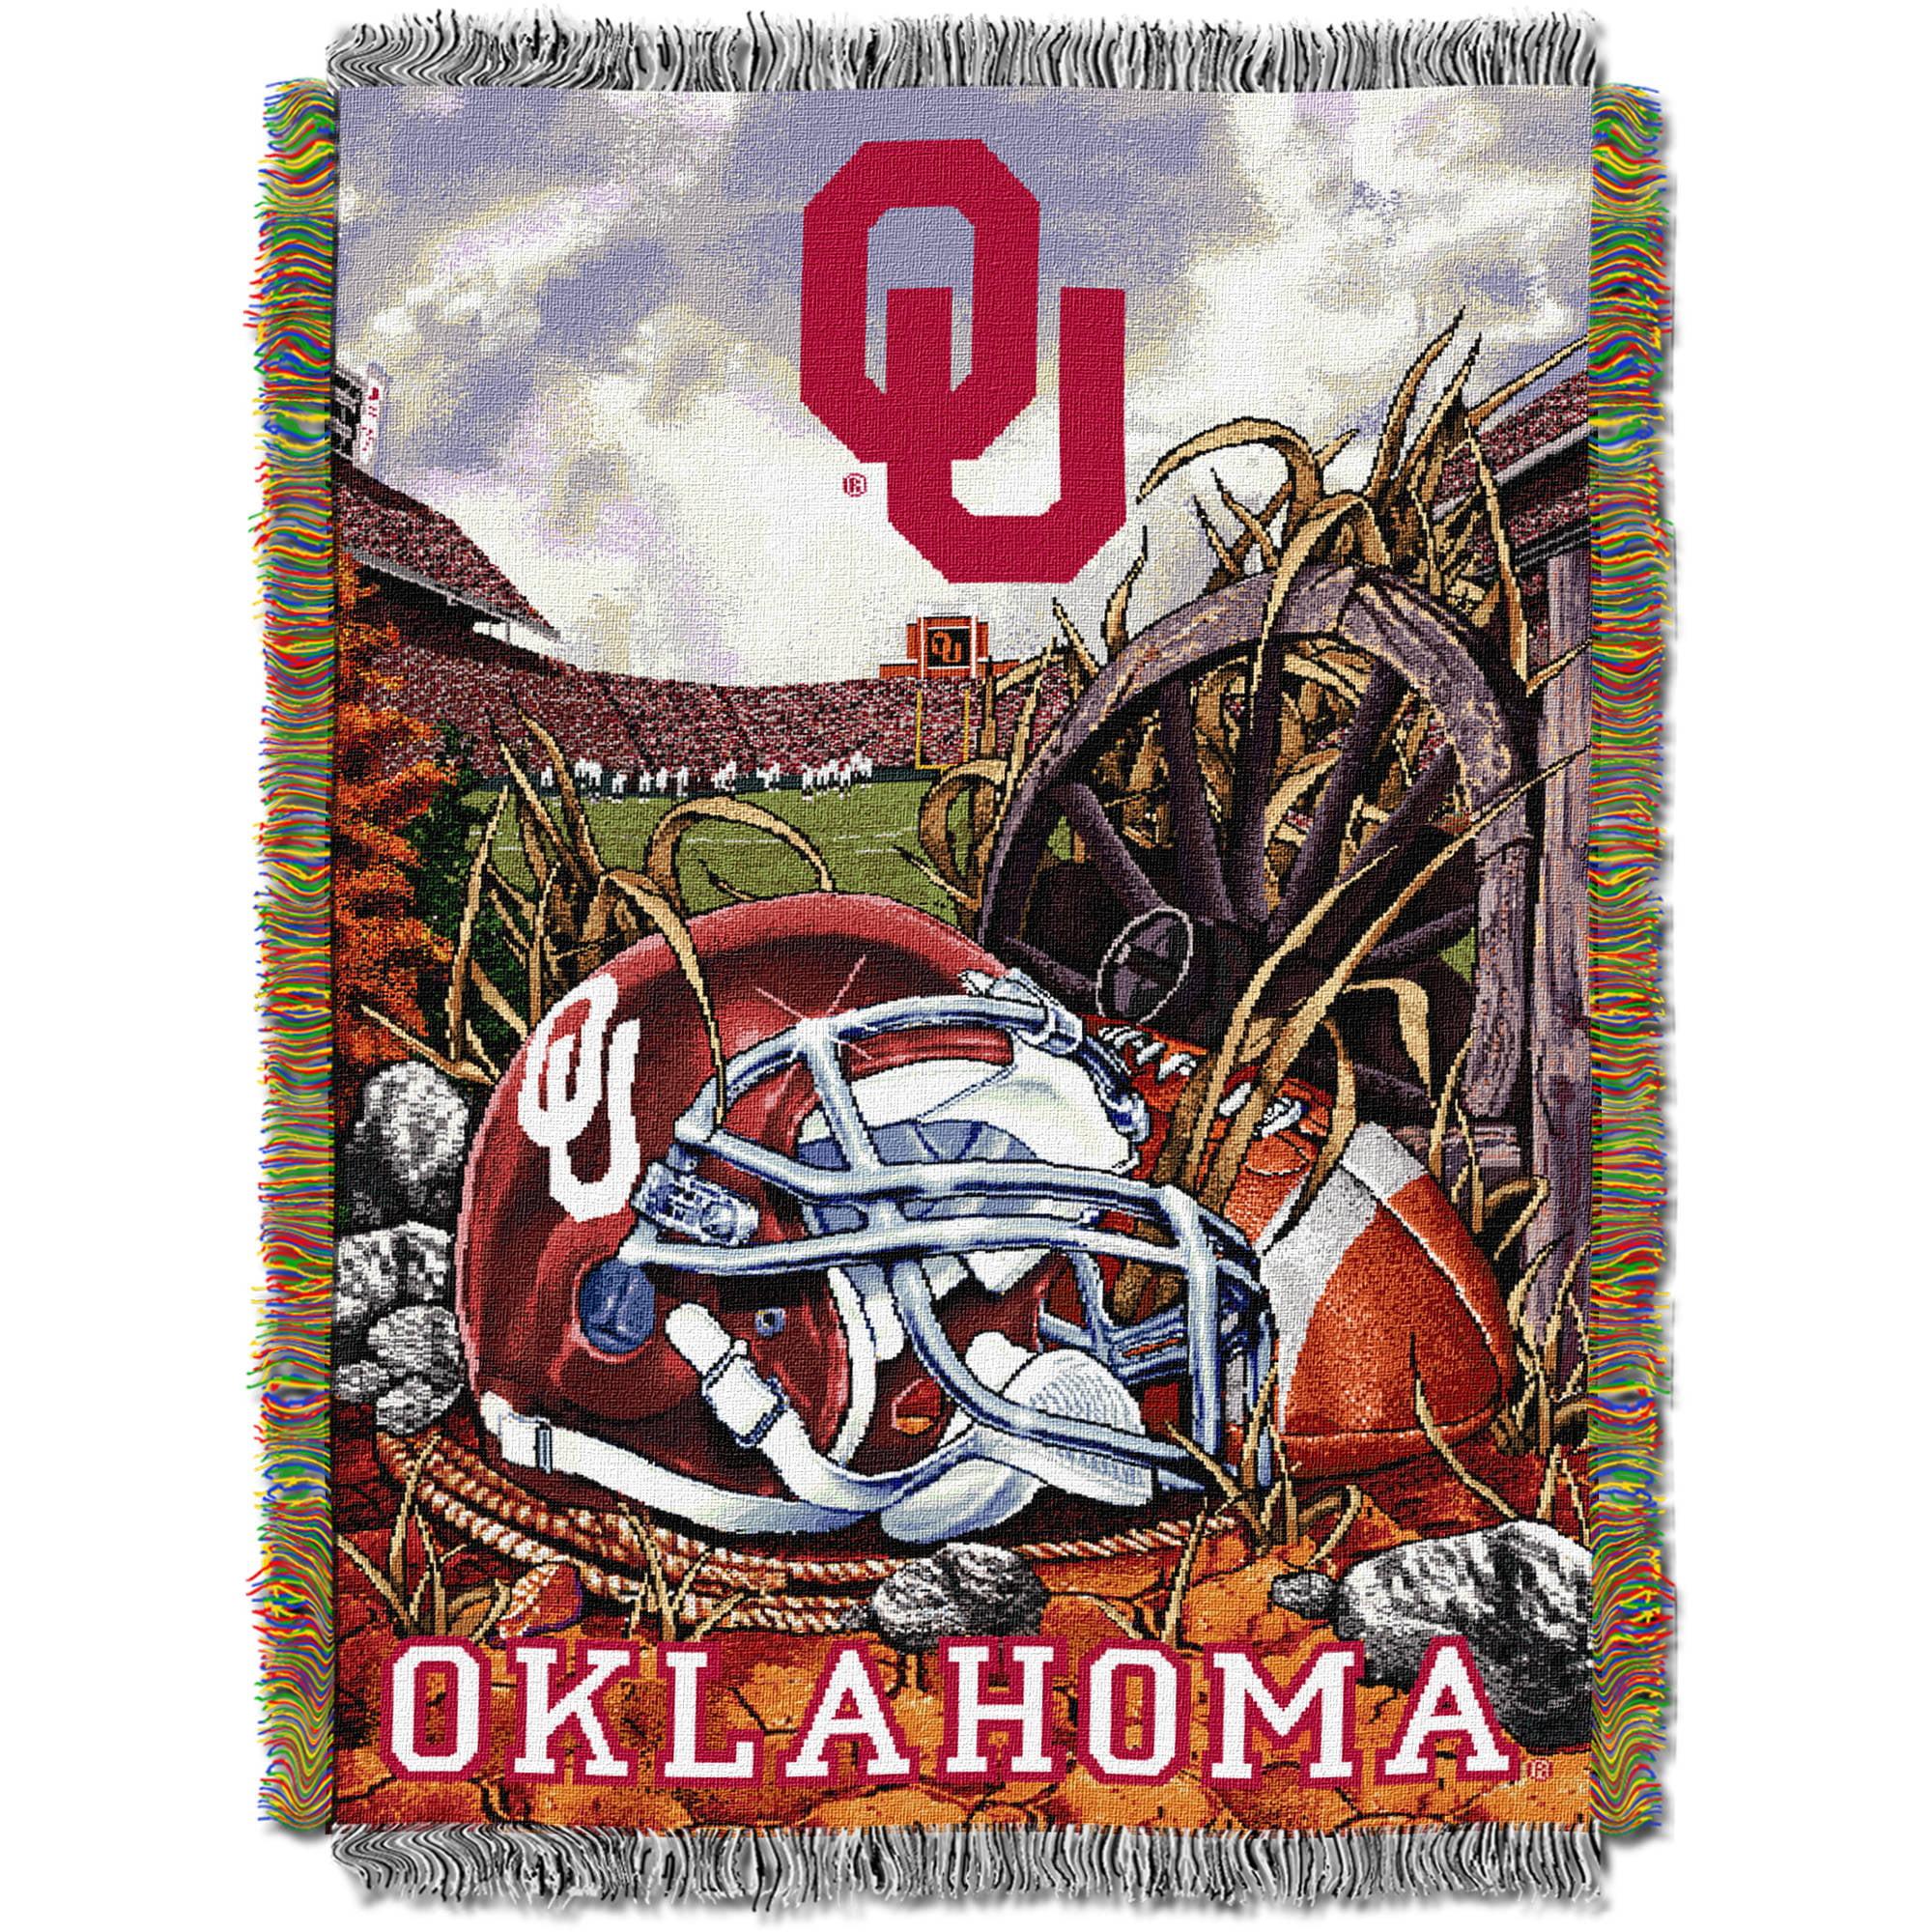 "NCAA 48"" x 60"" Tapestry Throw Home Field Advantage Series- Oklahoma"